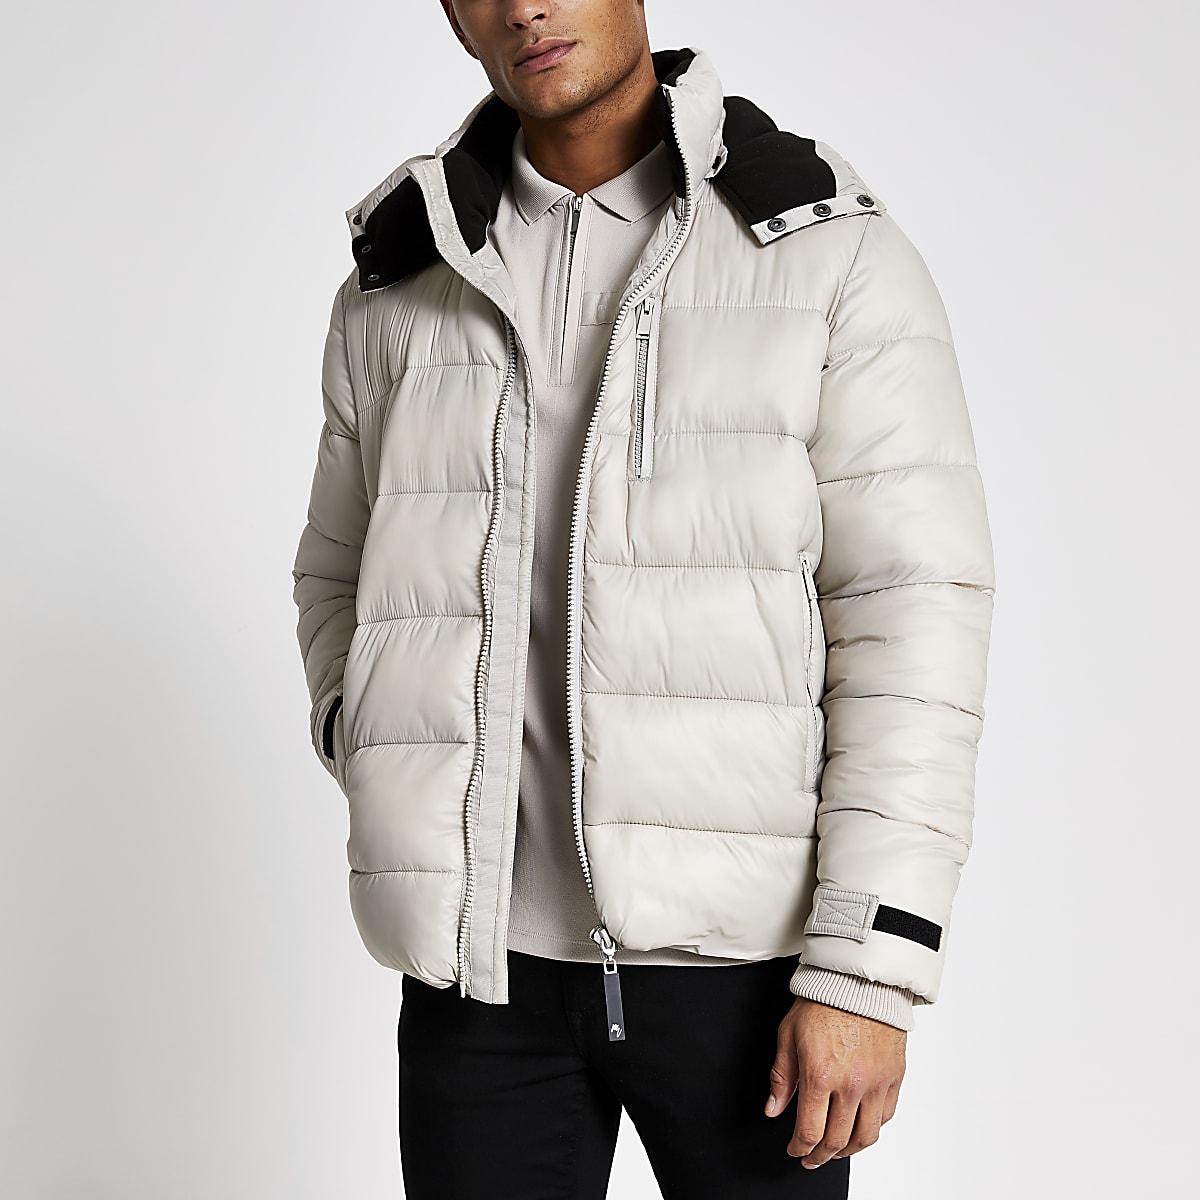 Maison Riviera grey tape padded jacket